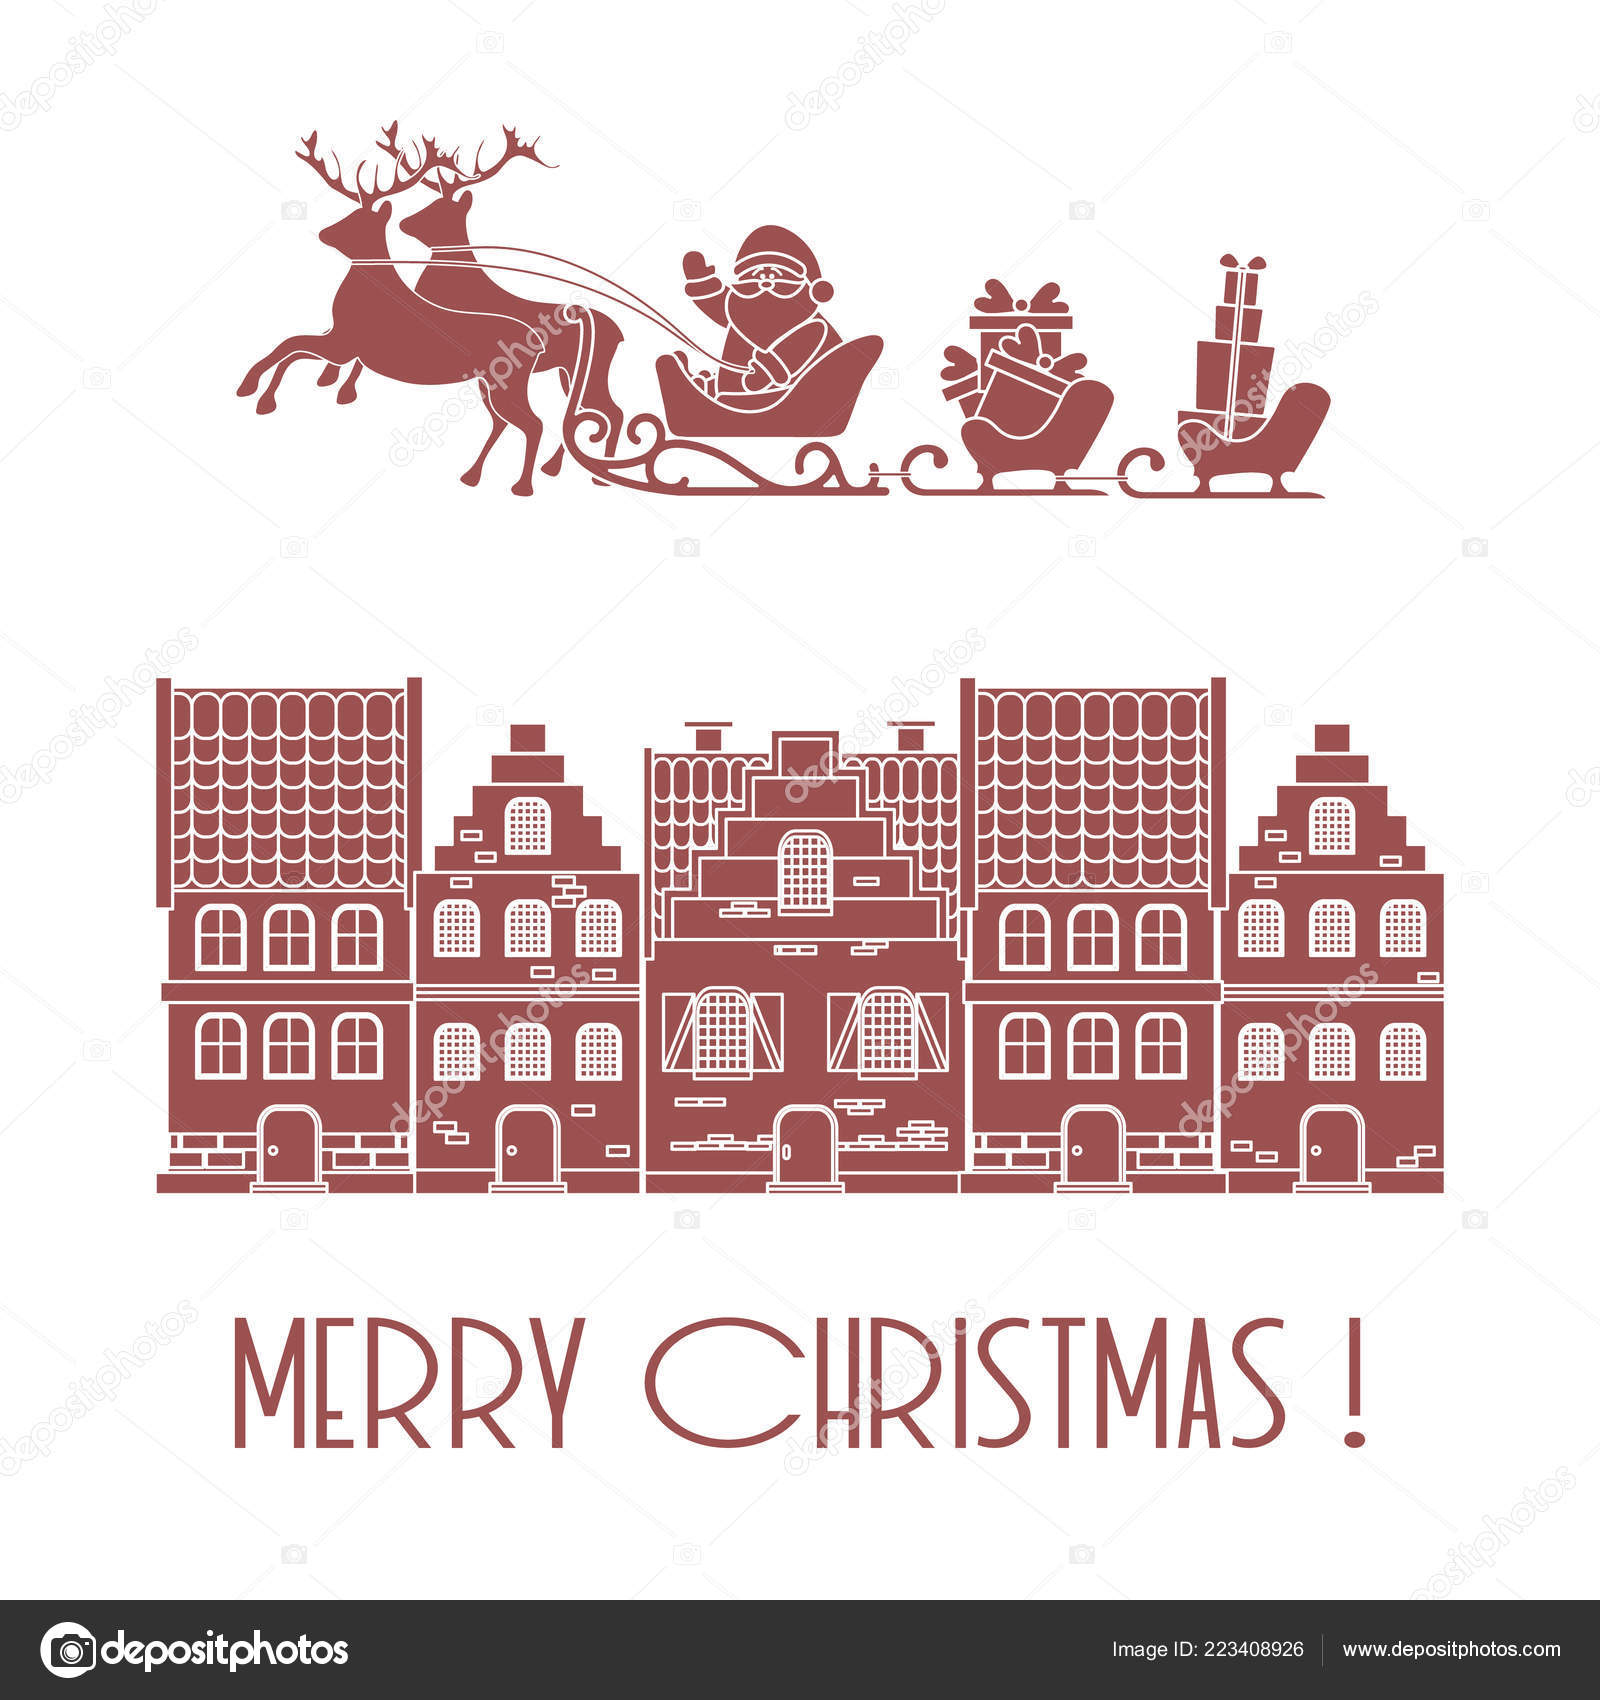 Christmas Card Vector Illustration Santa Claus Gifts Sleighs ...